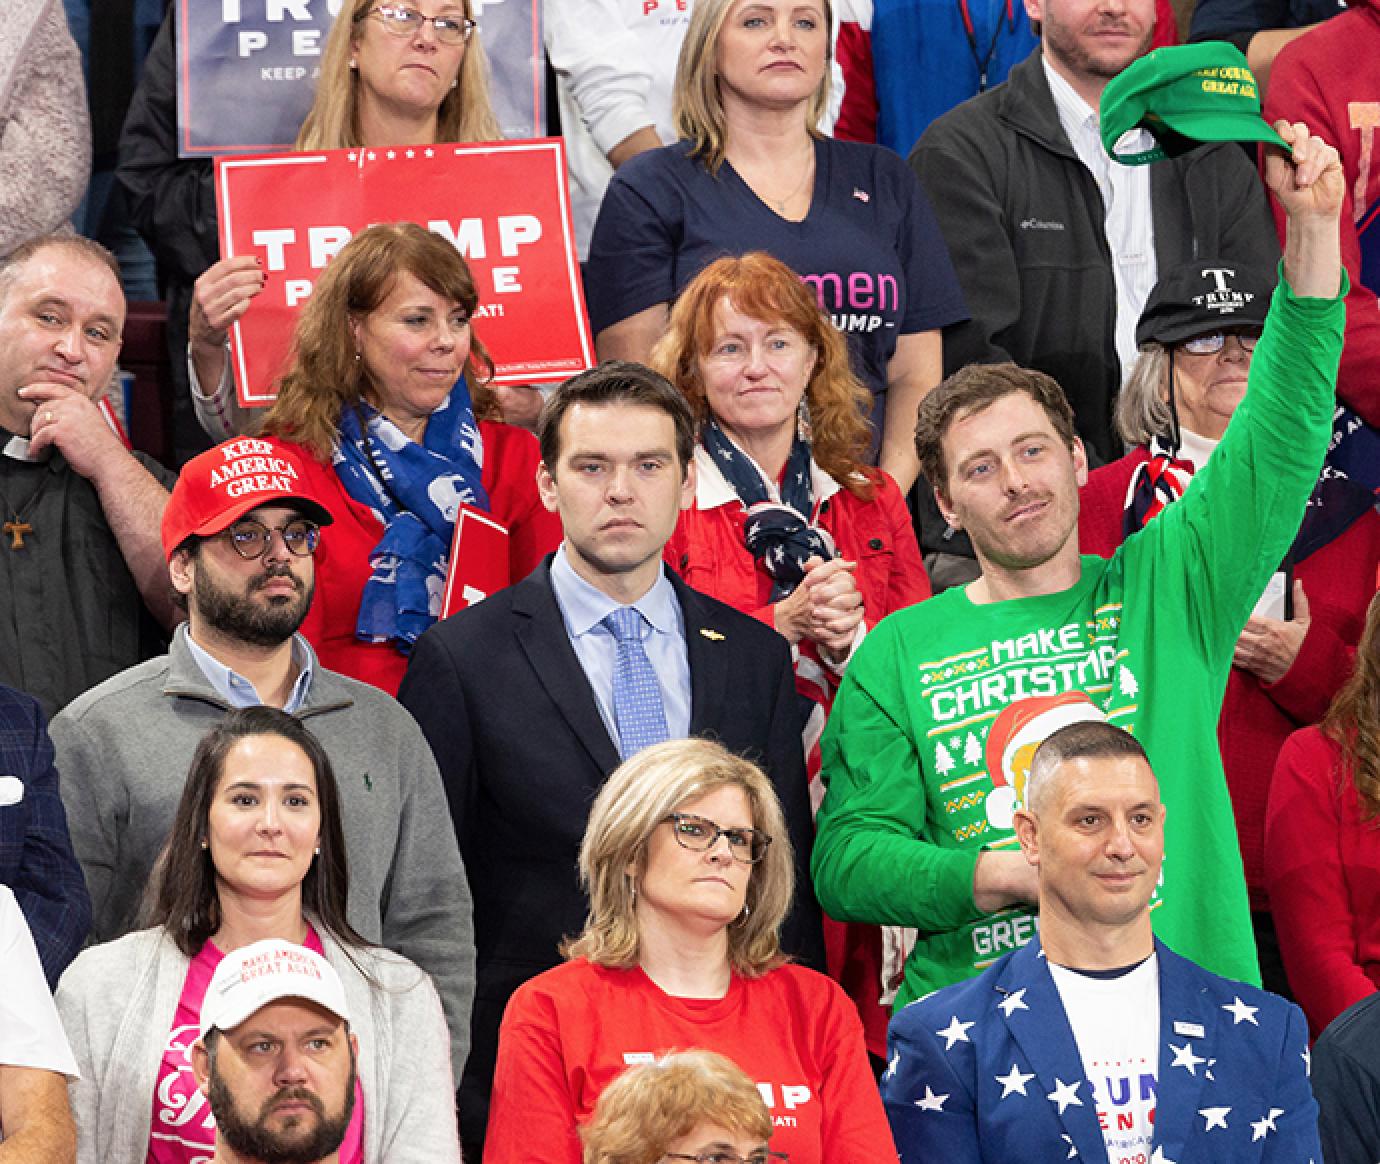 Jack Posobiec at Trump rally